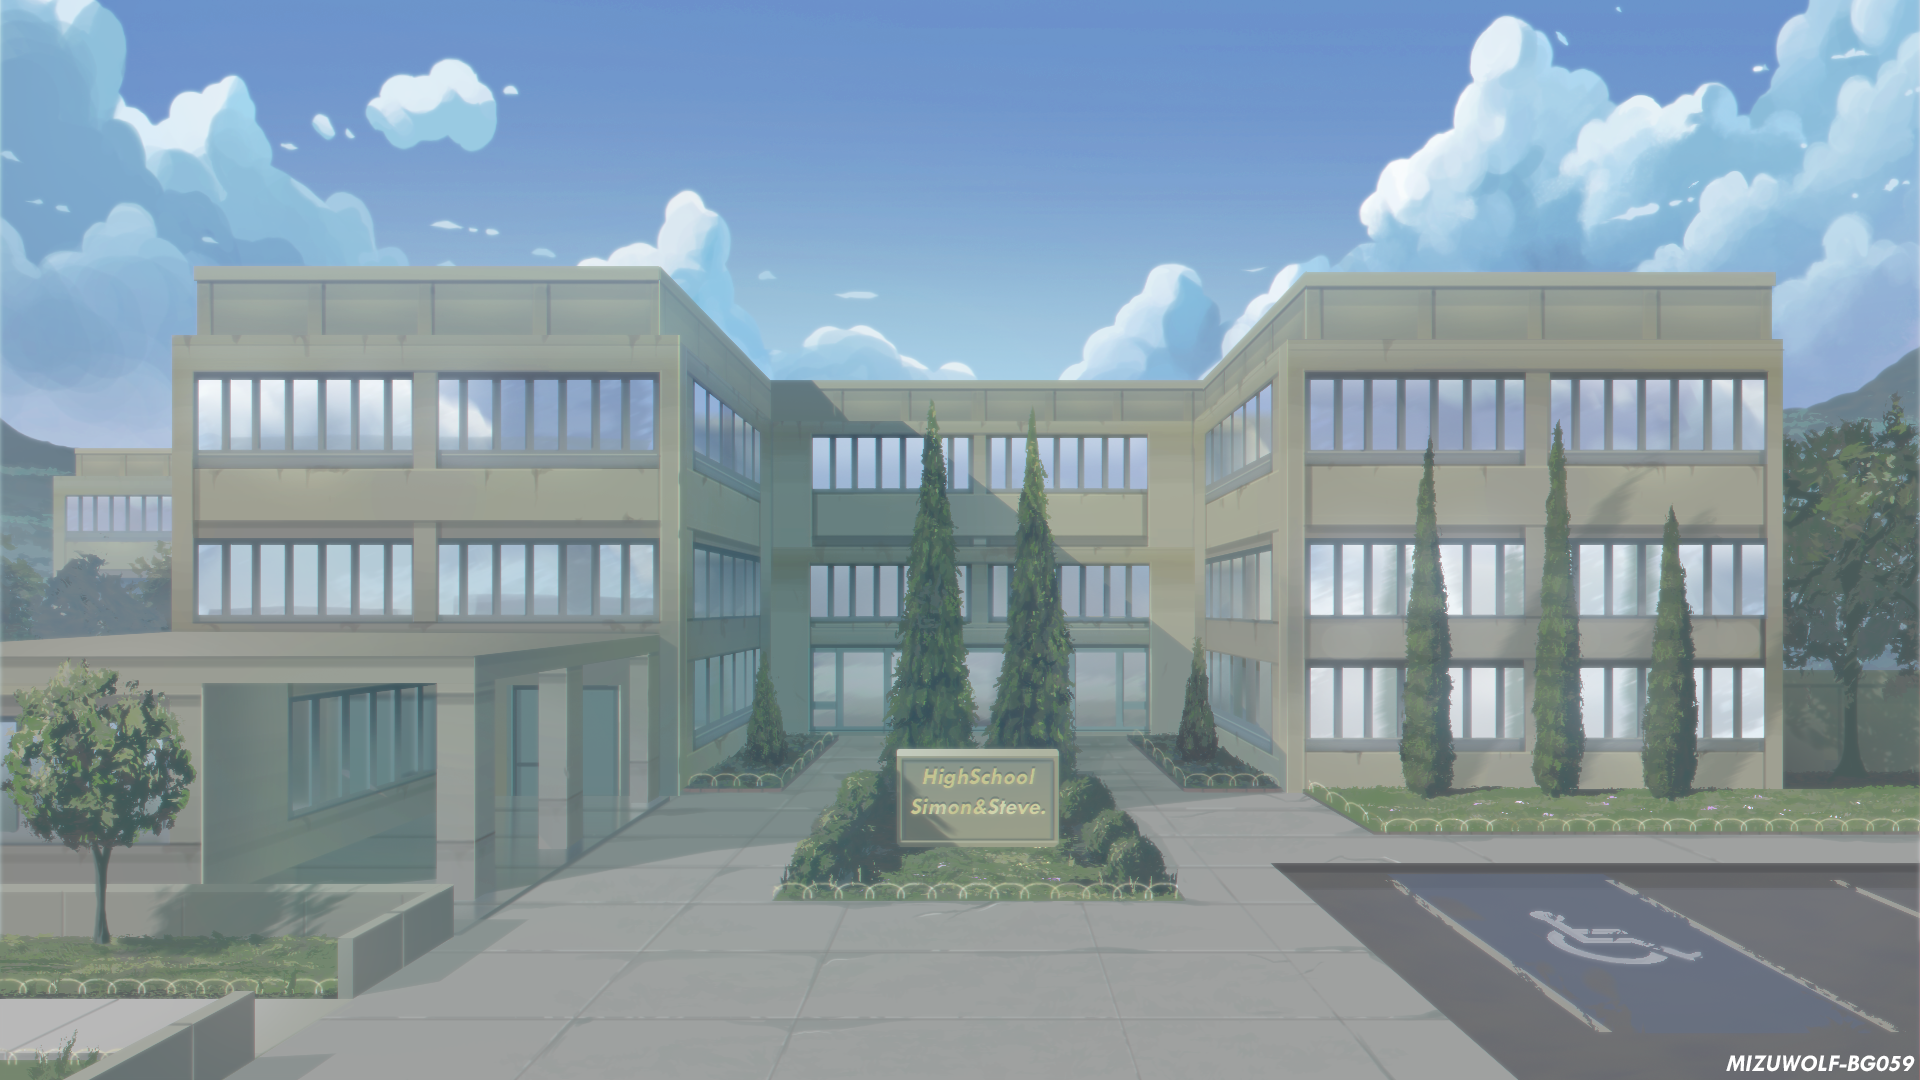 HighSchool S&S